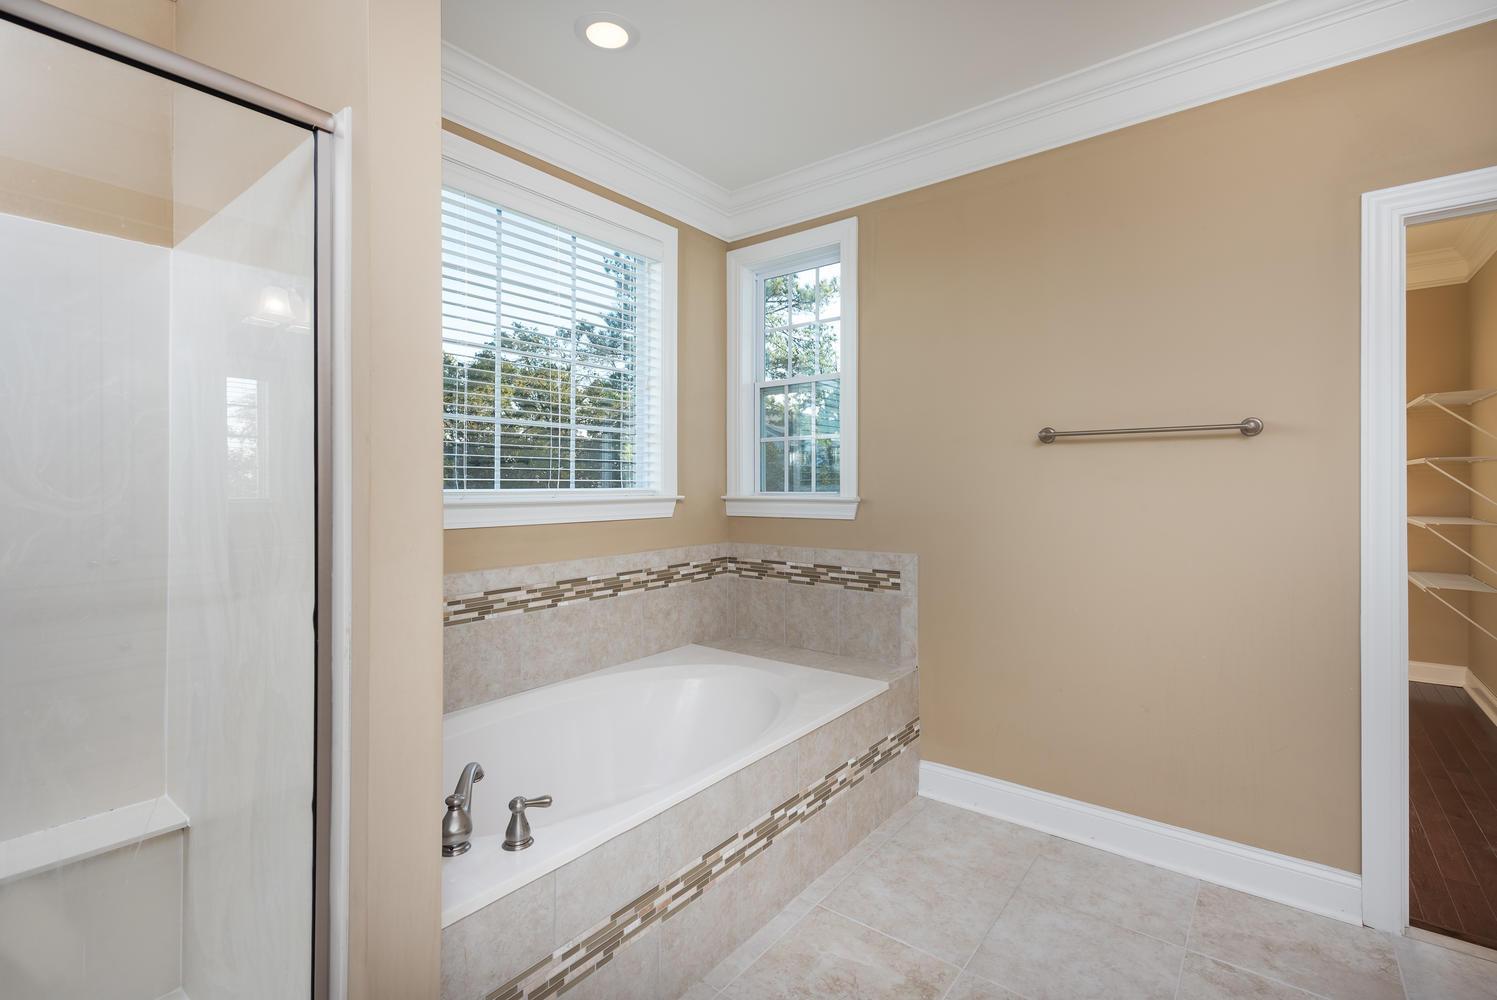 River Reach Pointe Homes For Sale - 1216 Rivers Reach Drive, Charleston, SC - 49